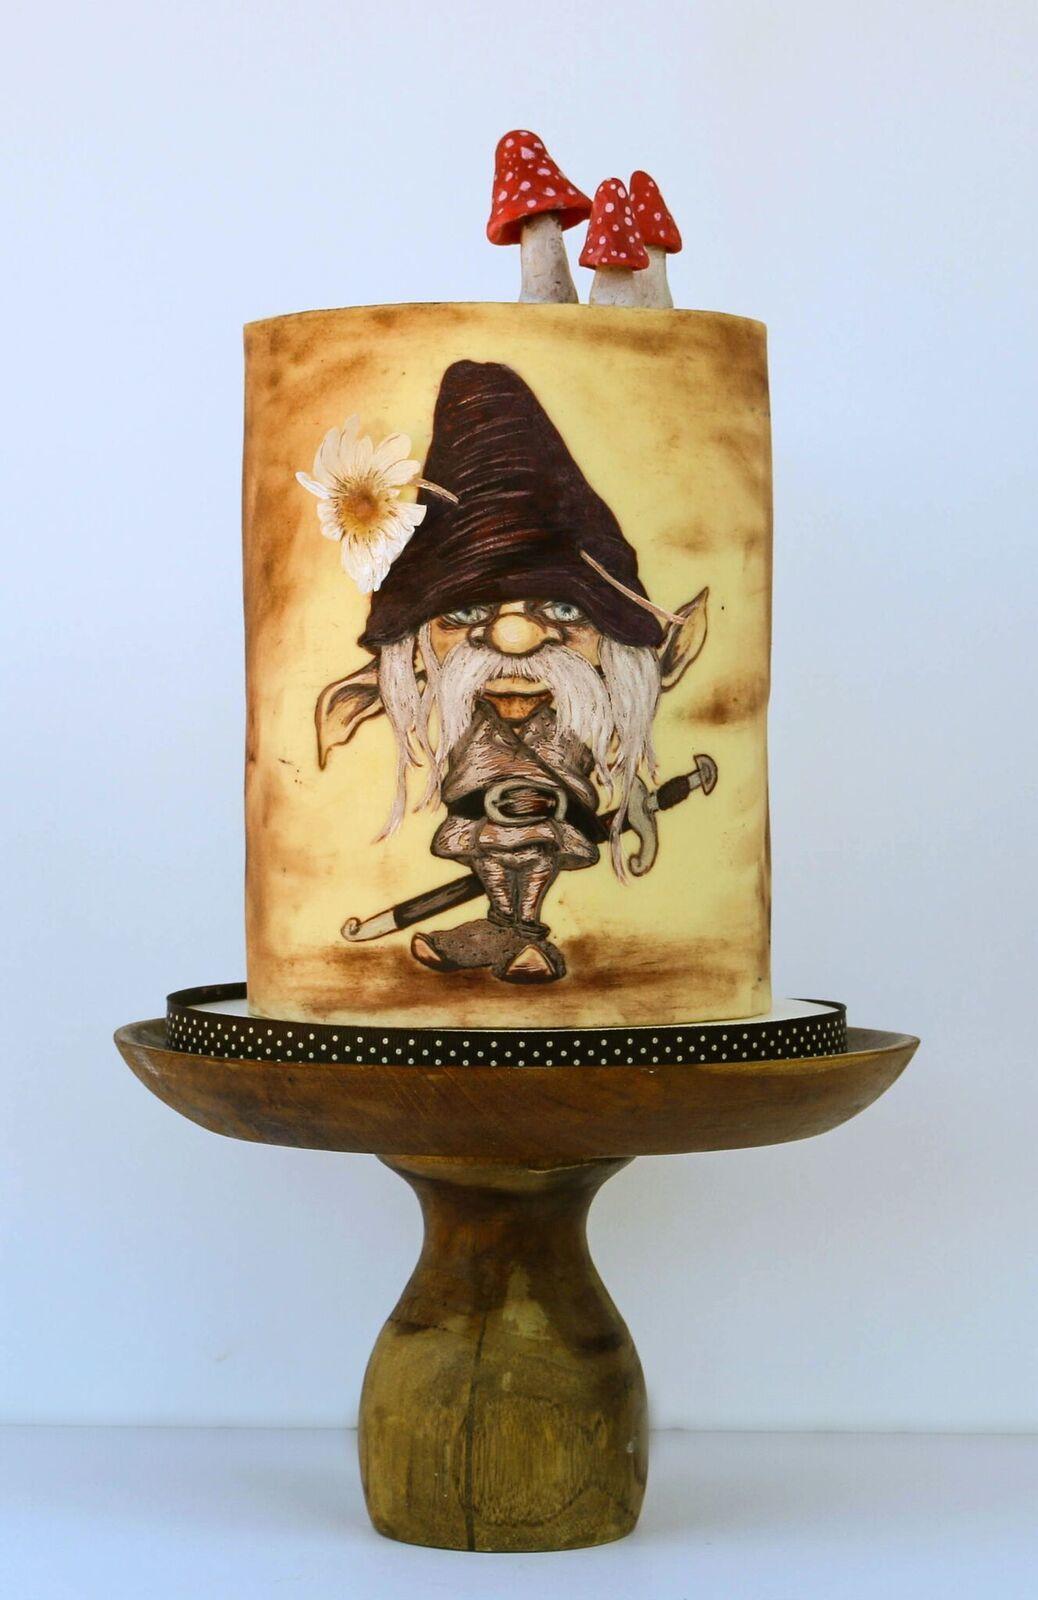 Handpainted woodland gnome cake with mushrooms